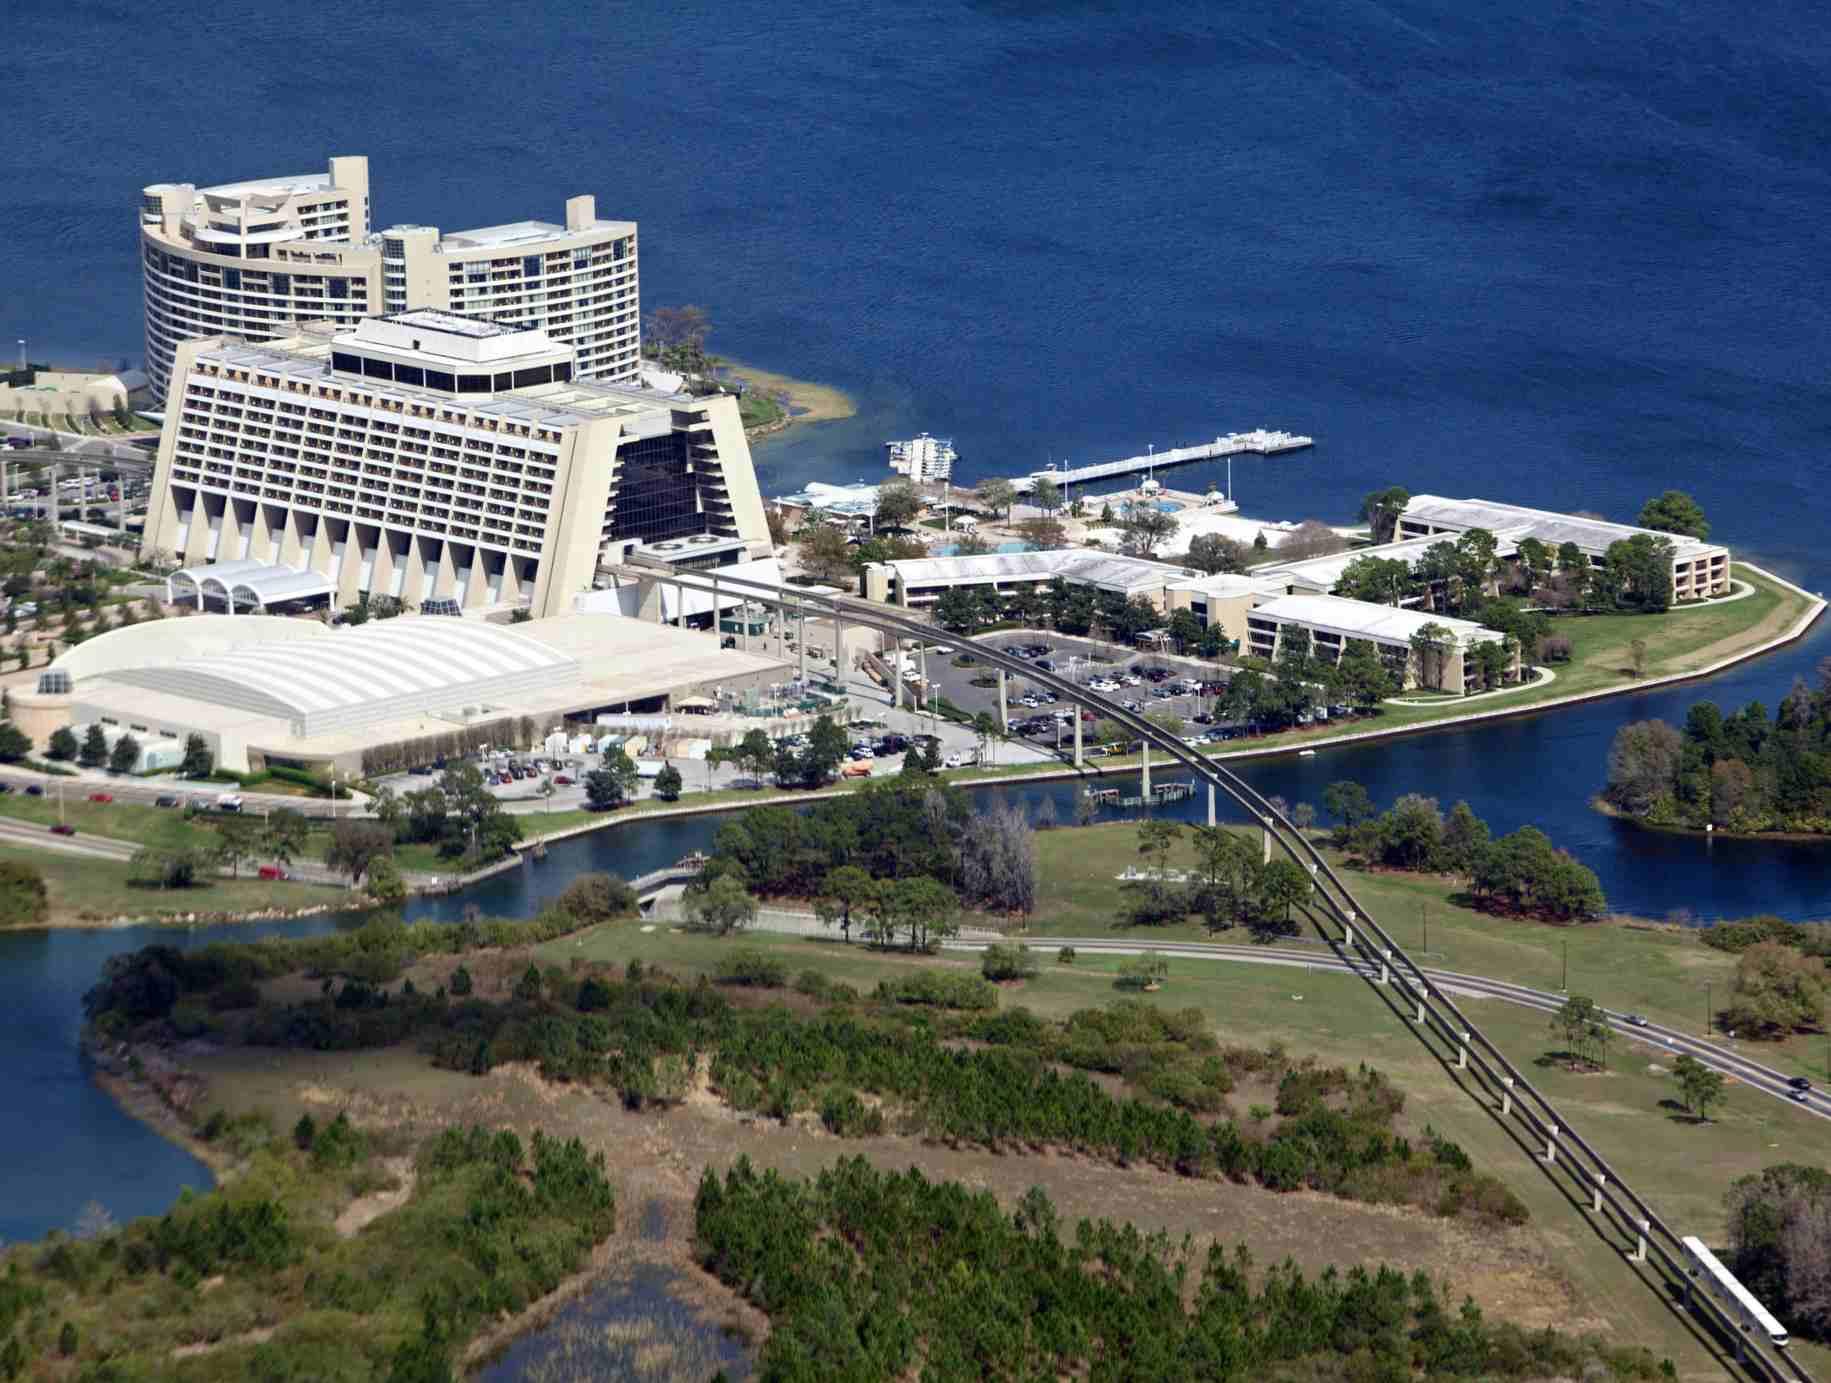 Disney's Contemporary Resort Orlando